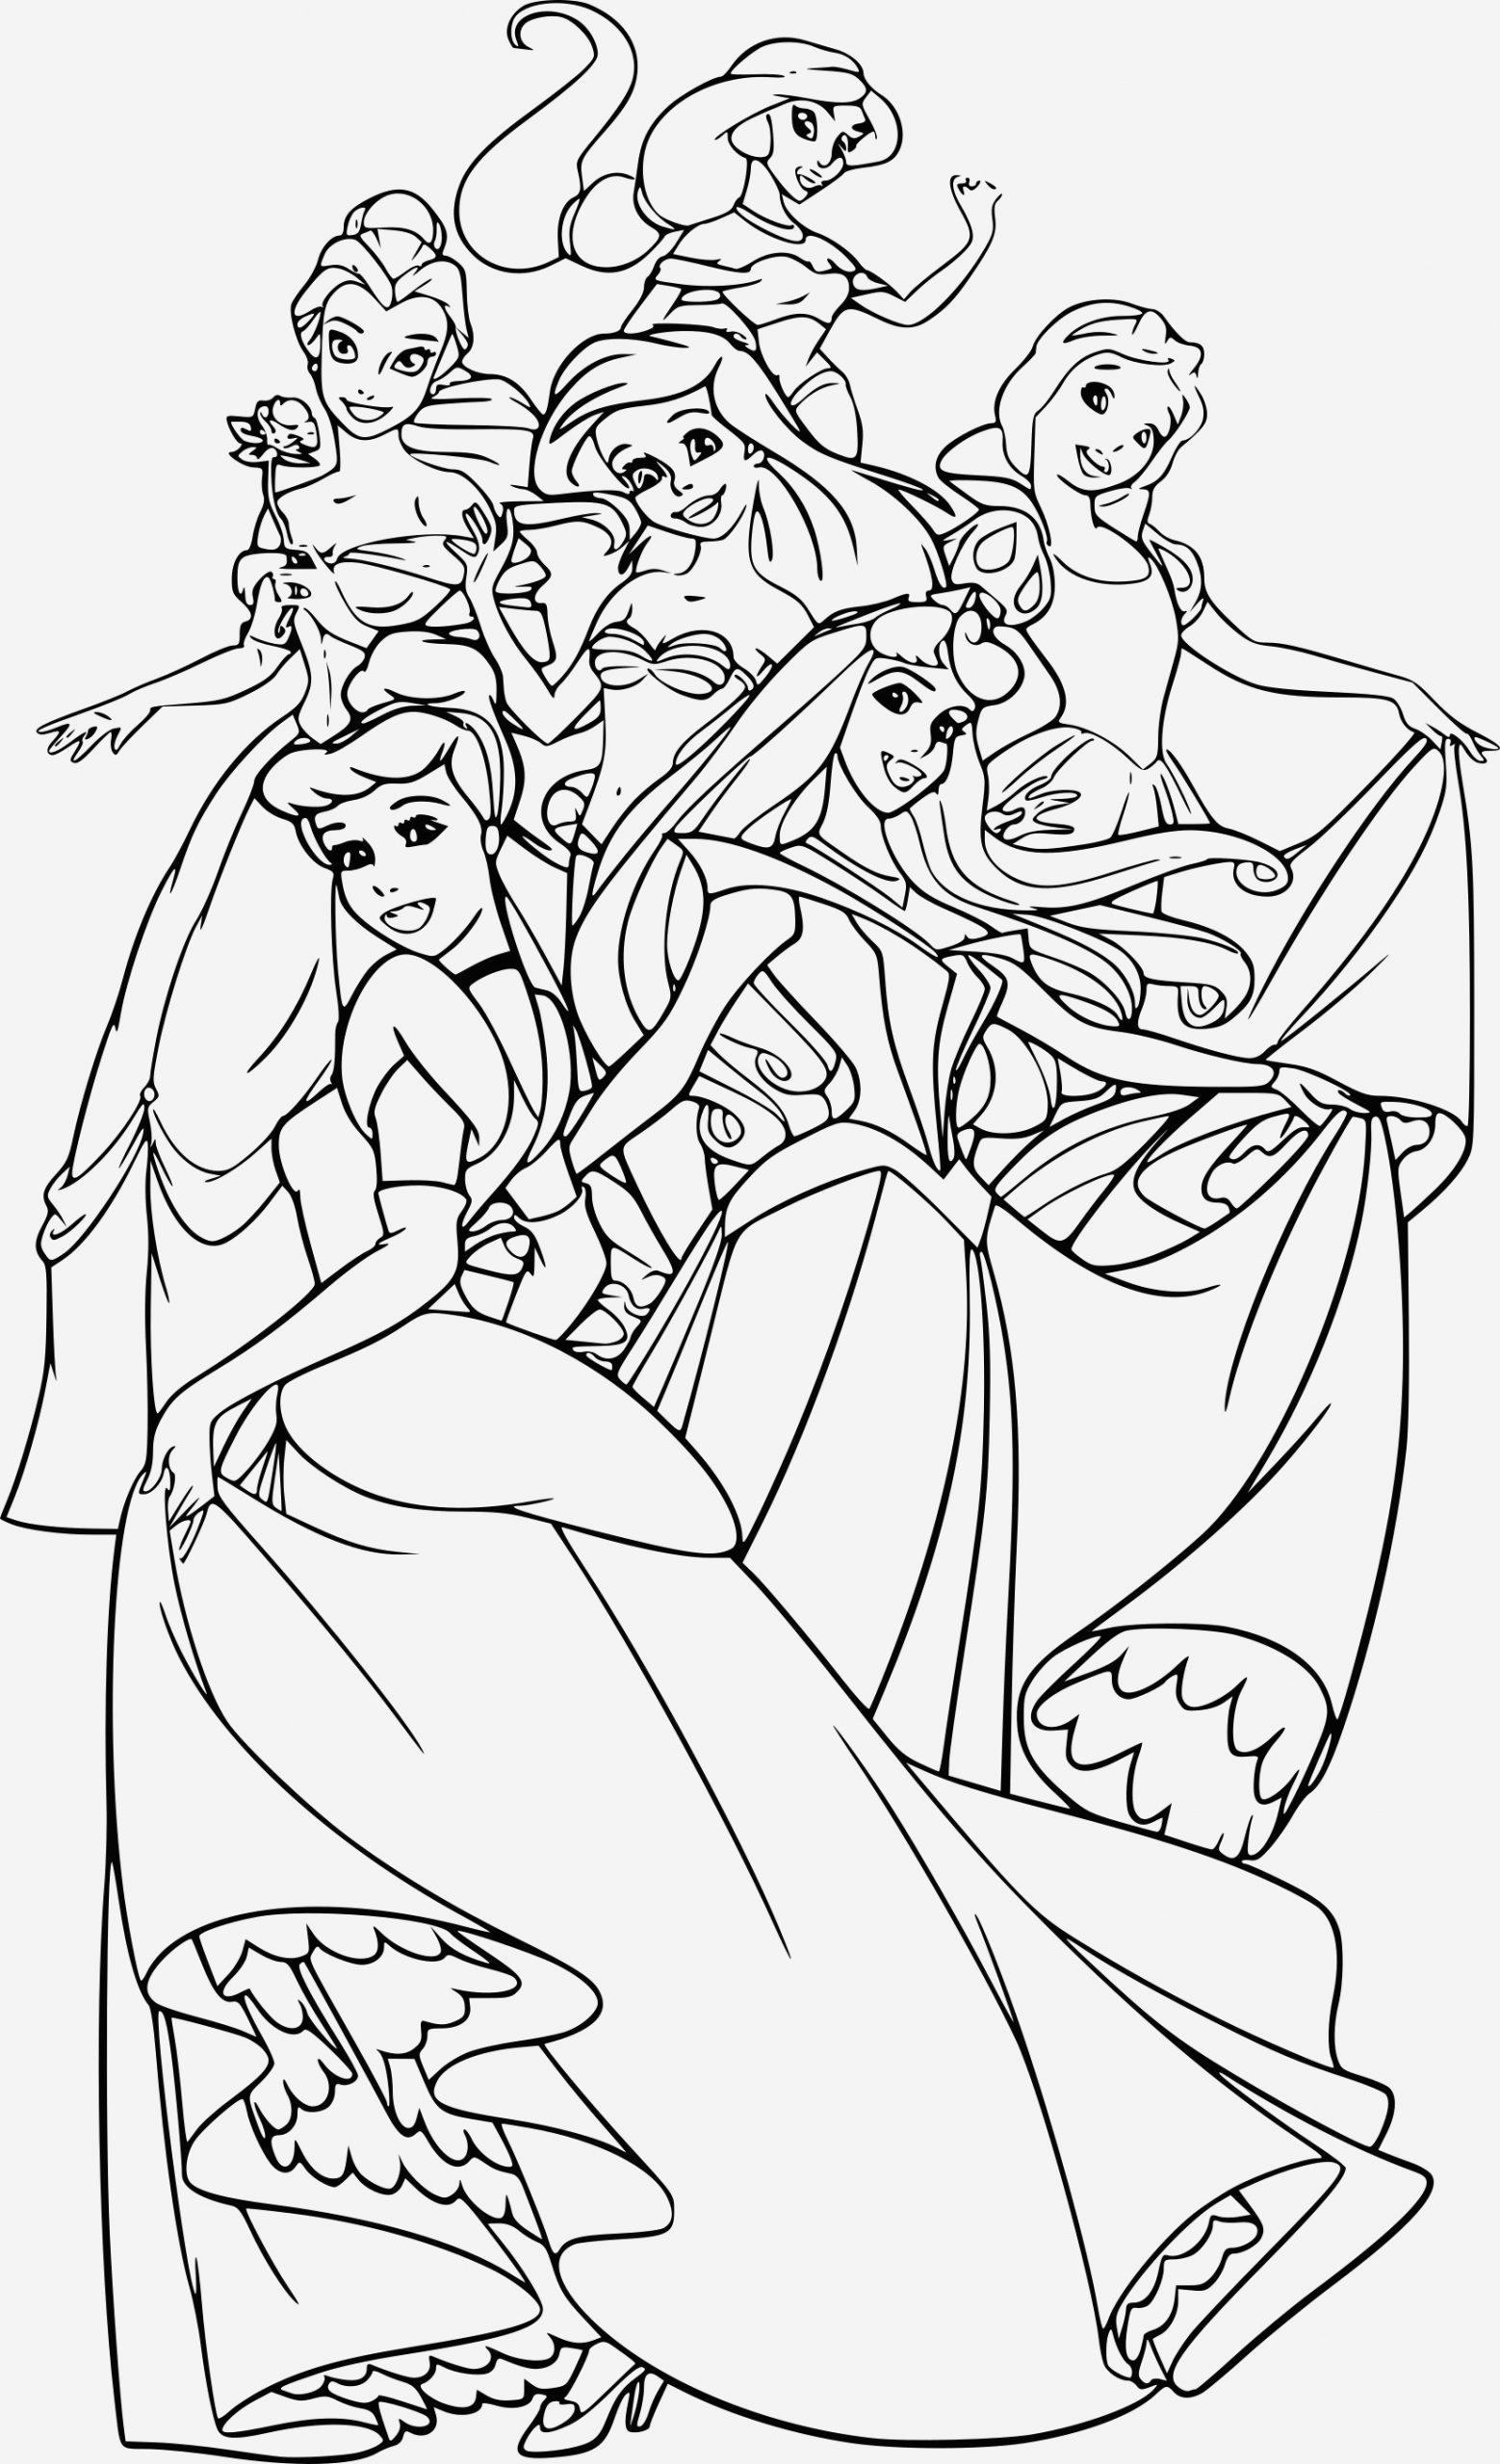 Coloriage Princesse Disney A Imprimer Pdf Archives avec Coloriage Princesses Disney À Imprimer